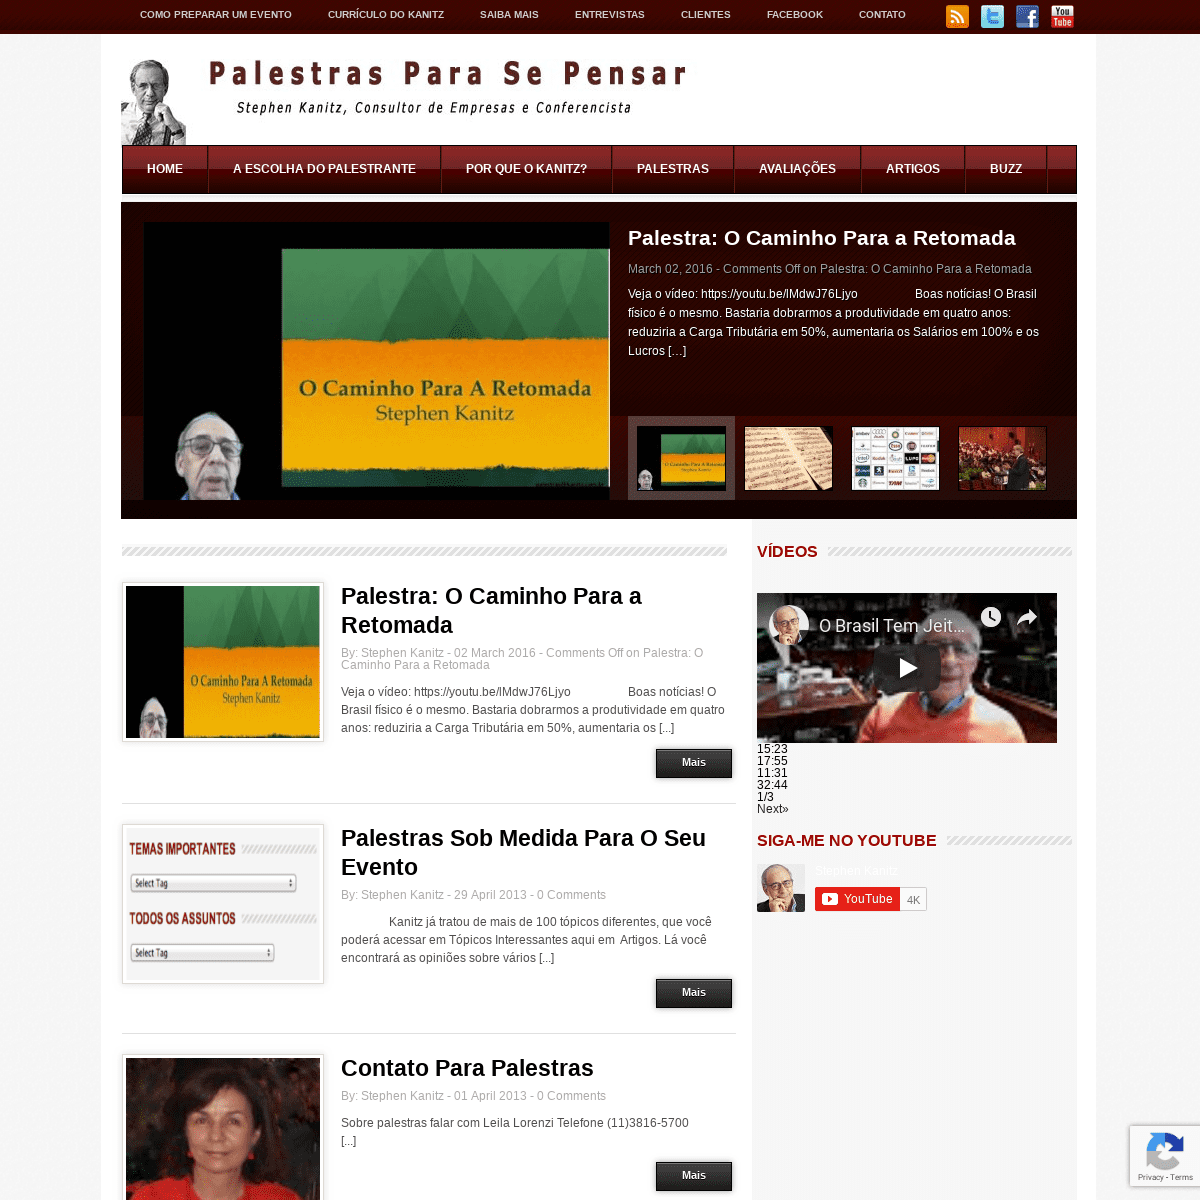 Palestrante Stephen Kanitz - Palestra Sobre Um Brasil Que Dá Certo